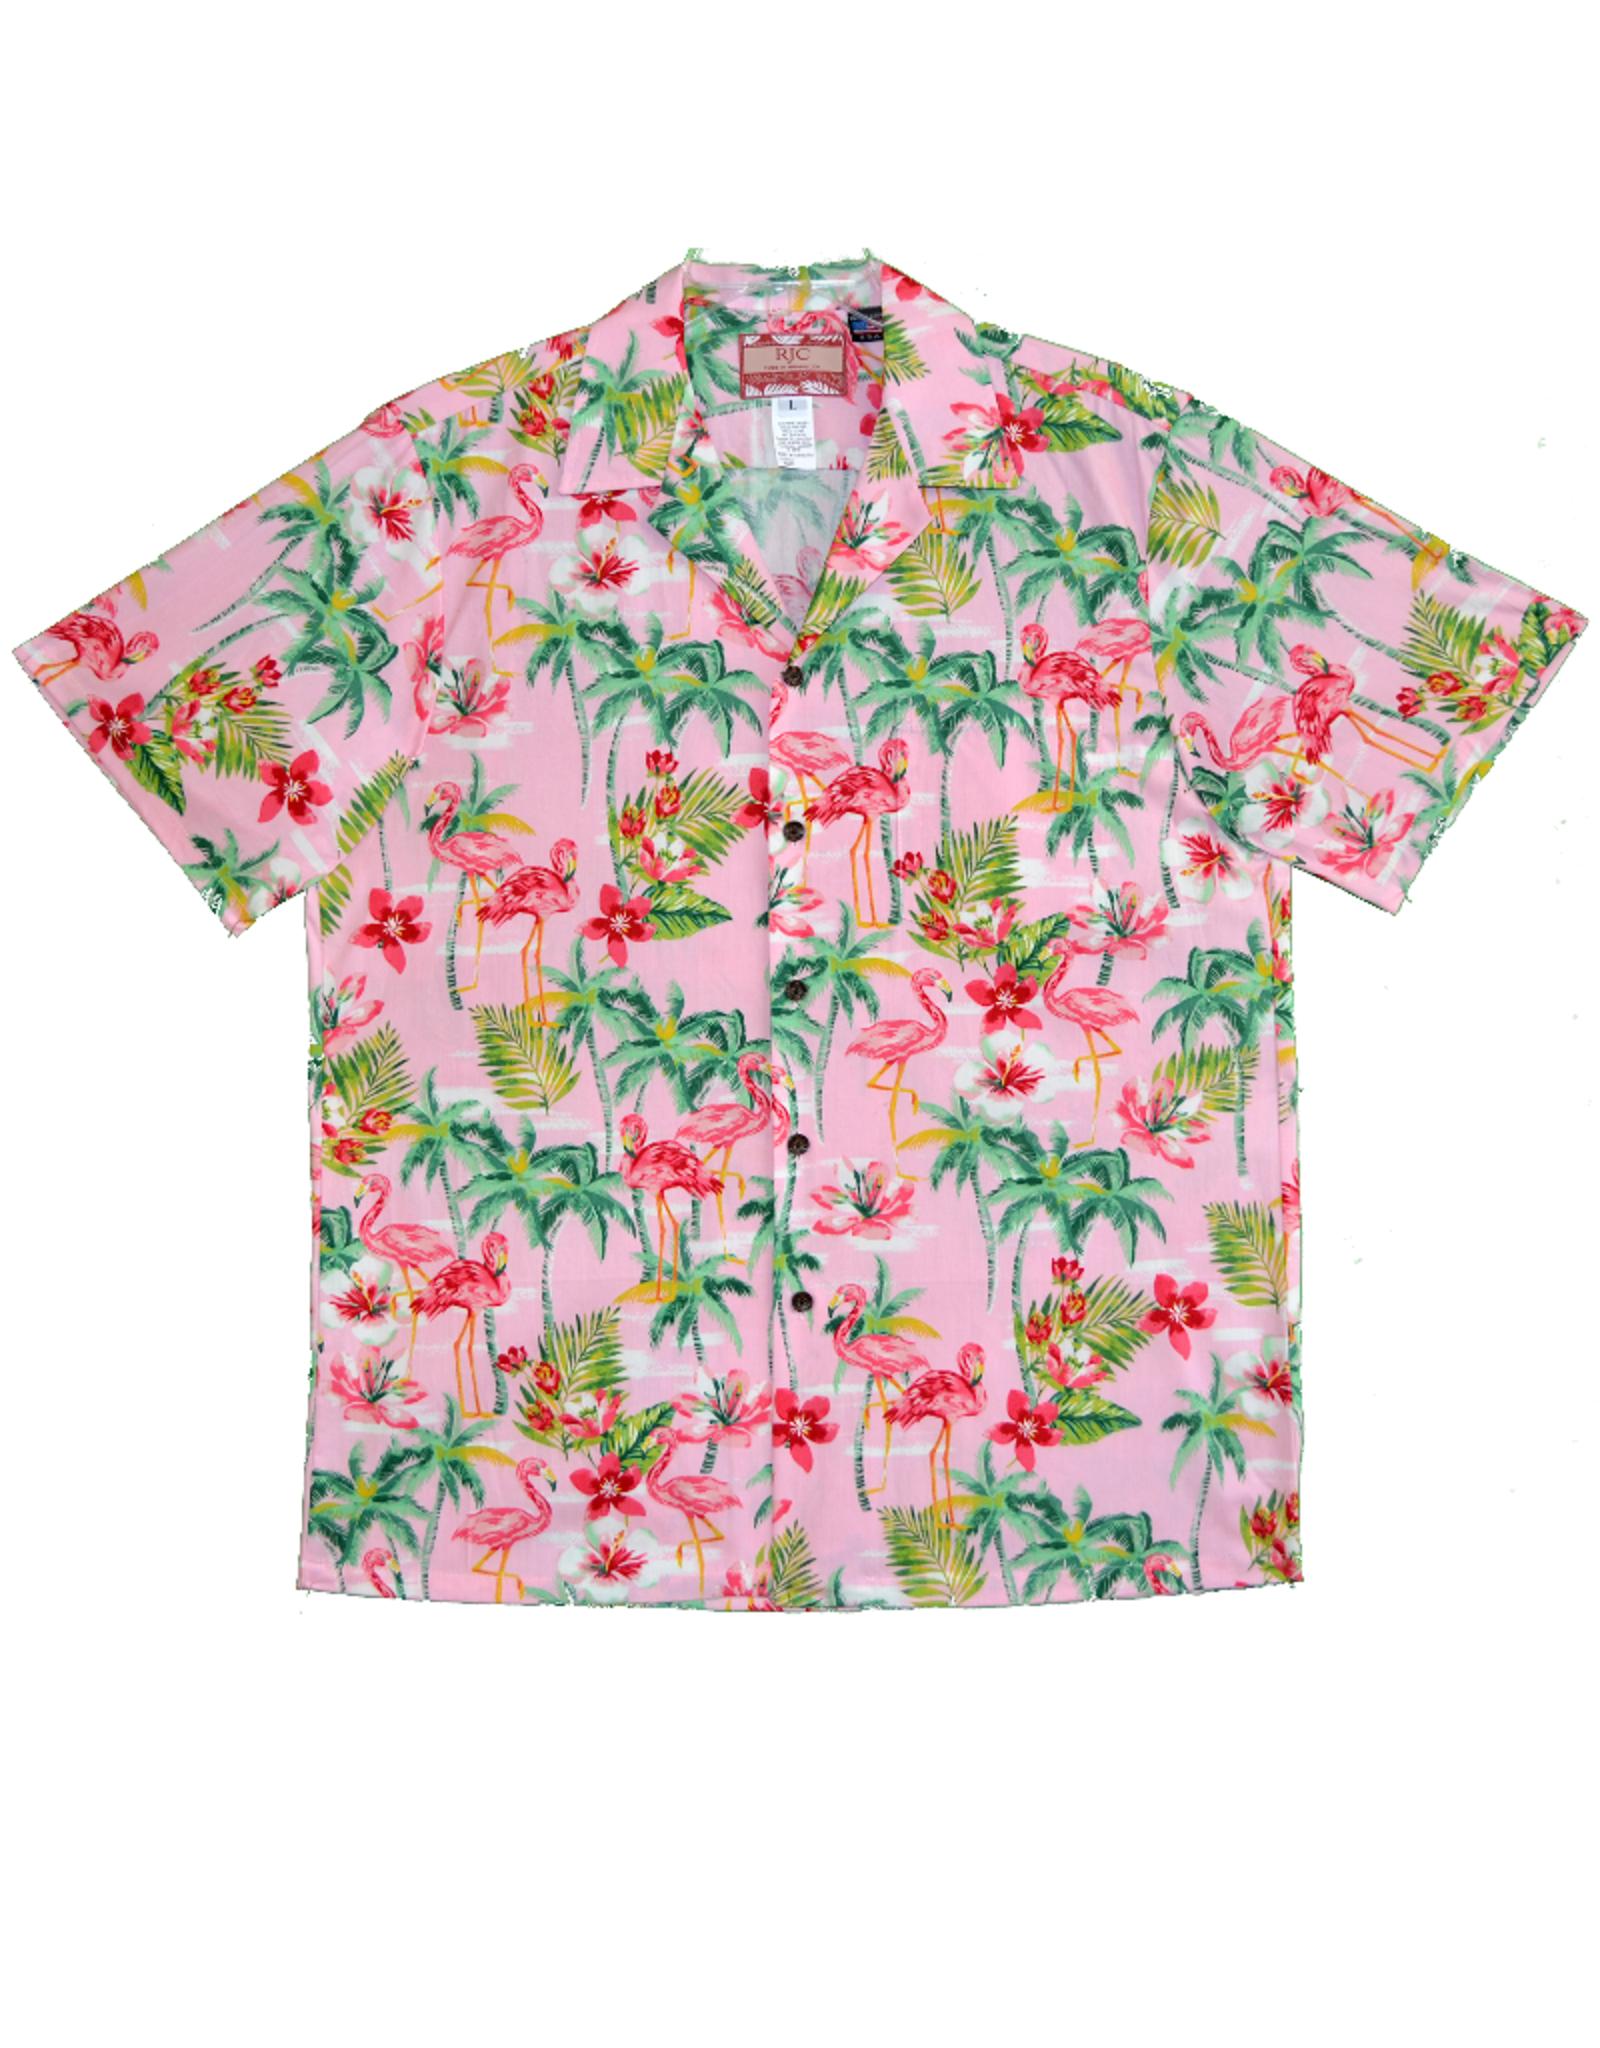 Robert J. Clancey Hawaiian Shirt 102C.204